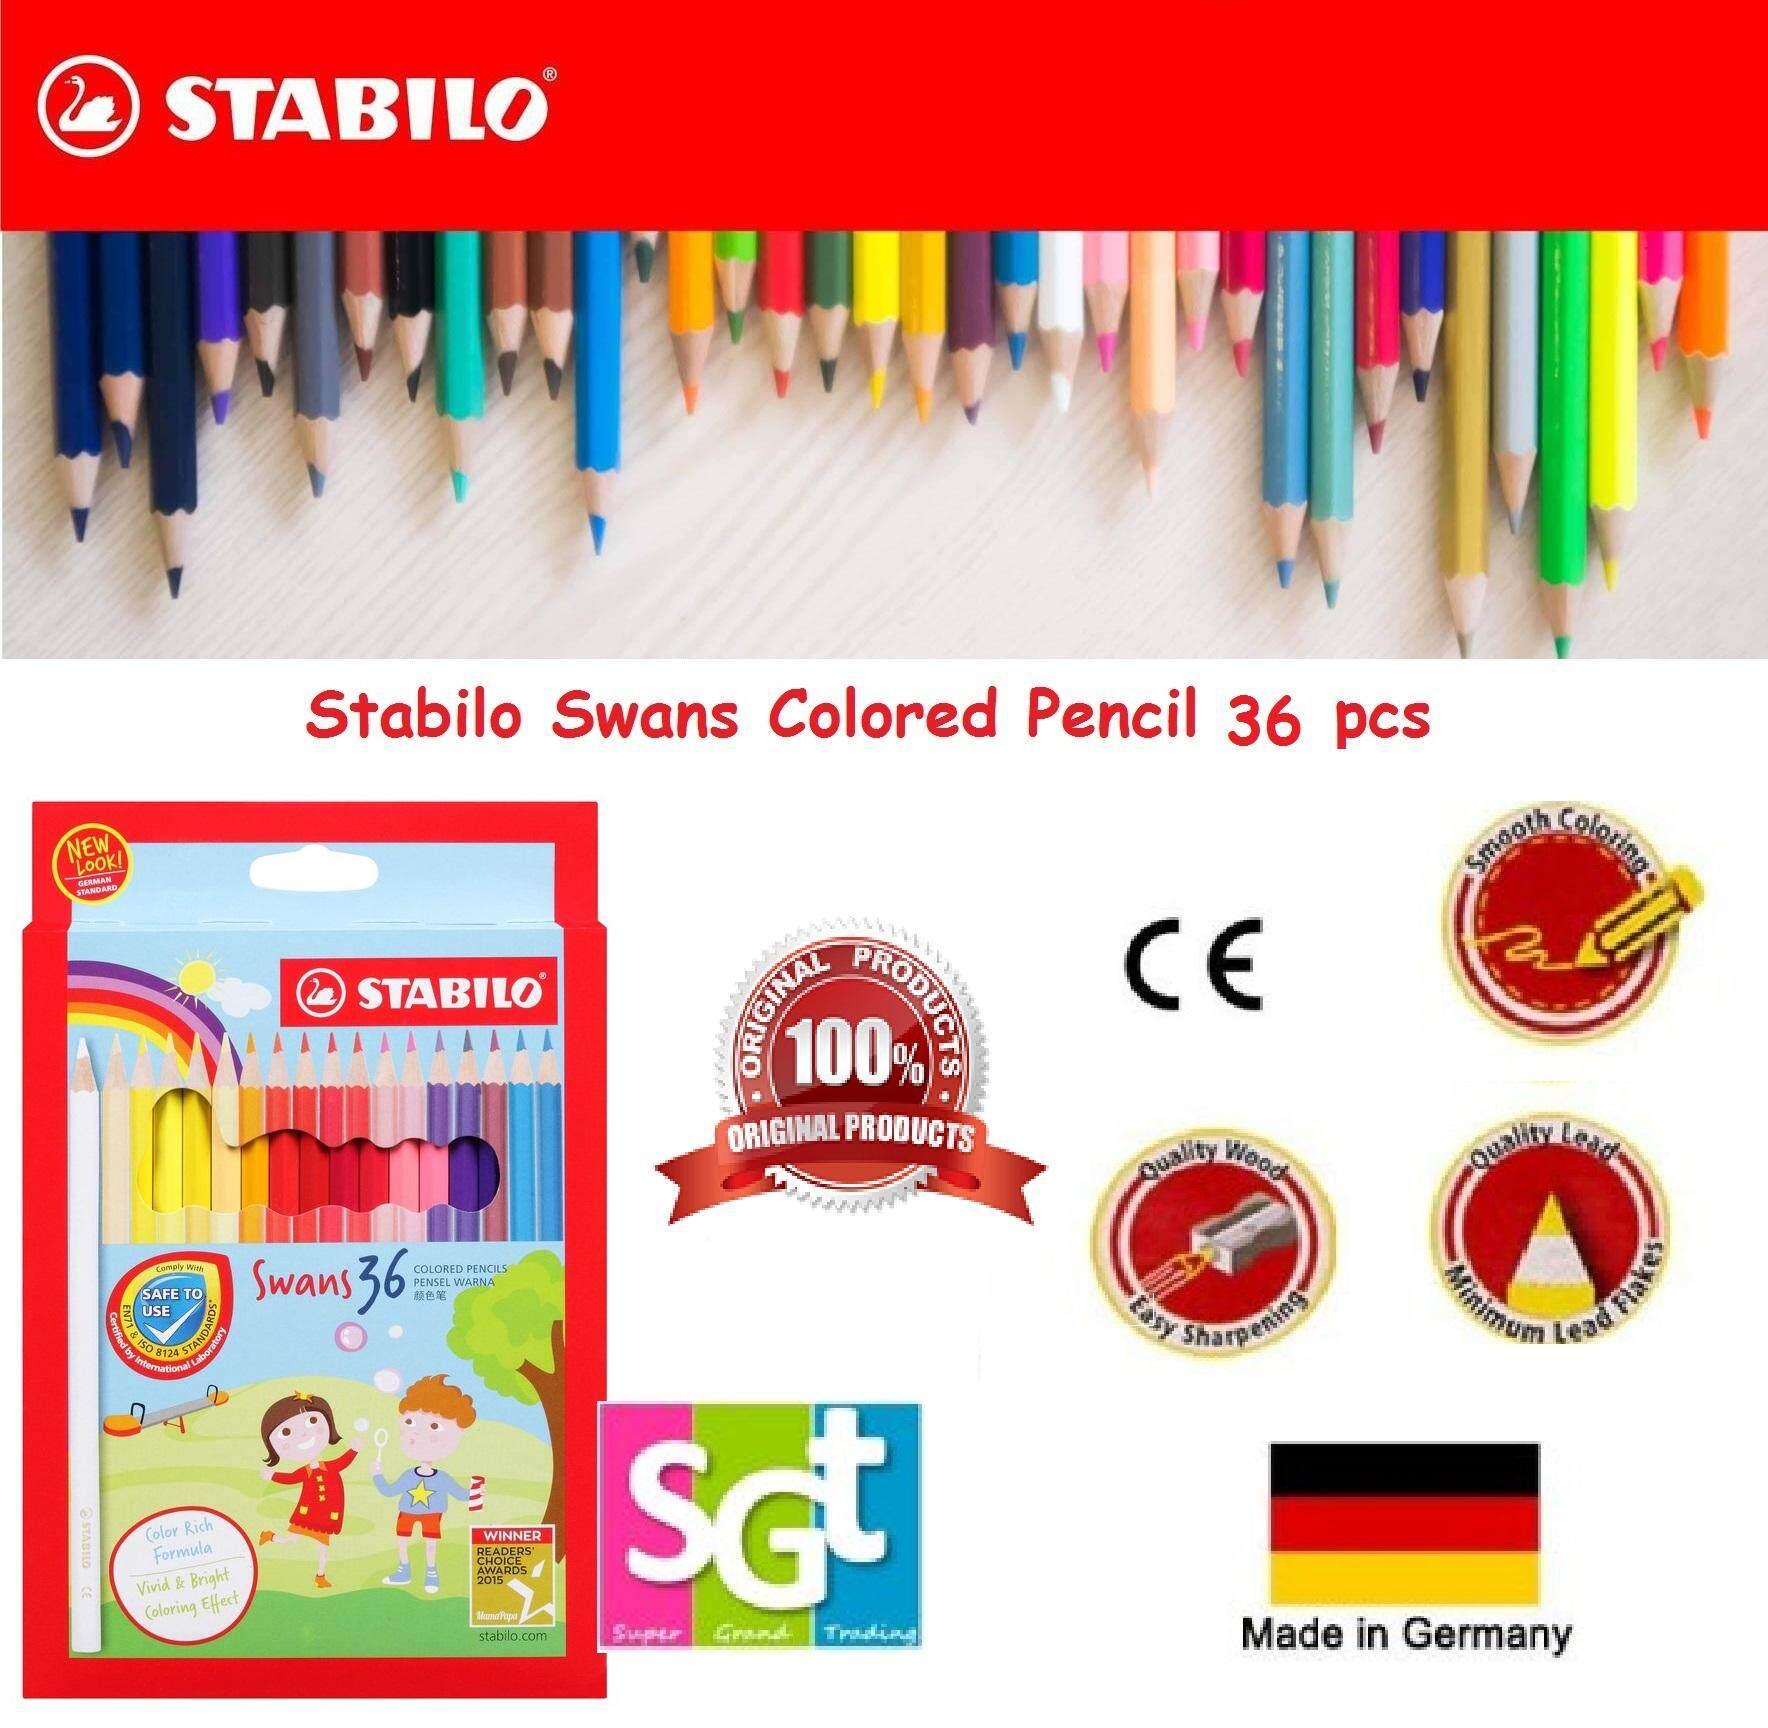 Stabilo Swans Colored Pencil 36pcs (Art No.1878)